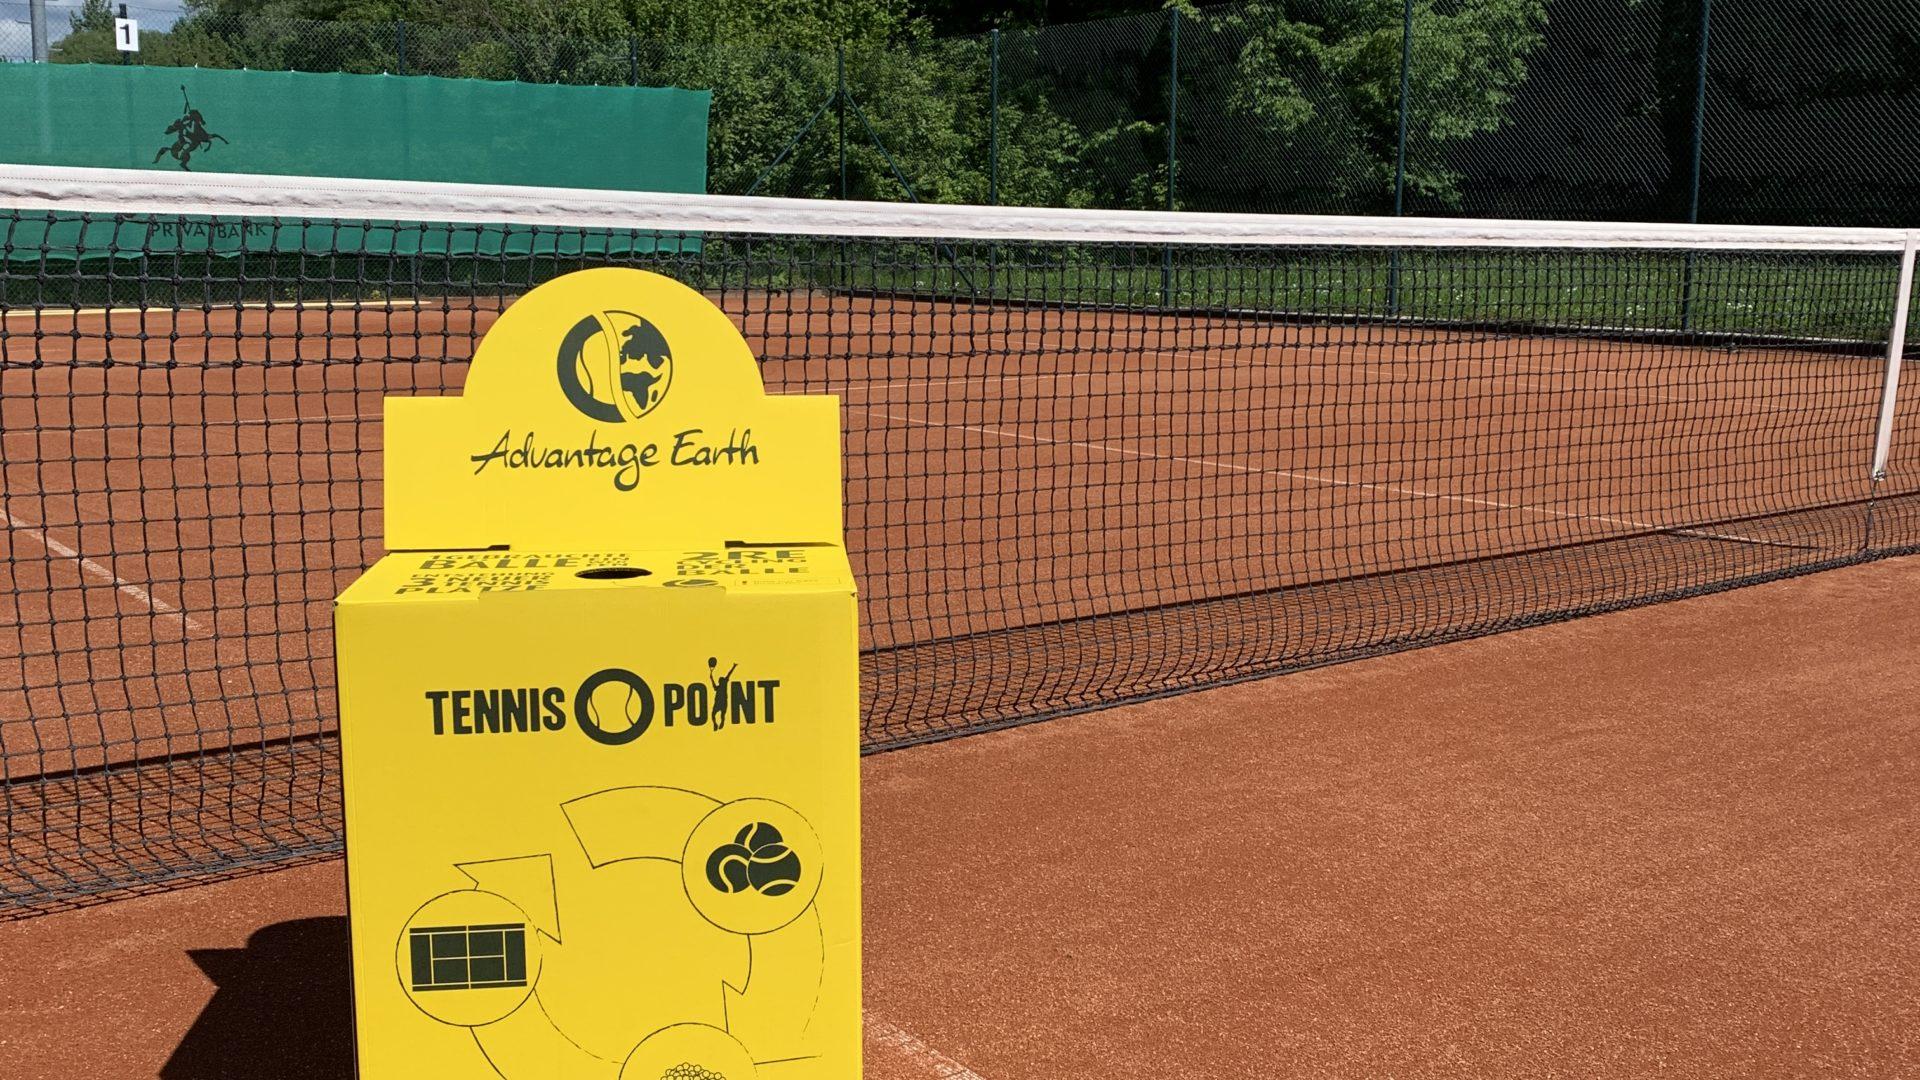 Der Tennisclub Groß-Bieberau engagiert sich im umweltfreundlichen Ball-Recycling